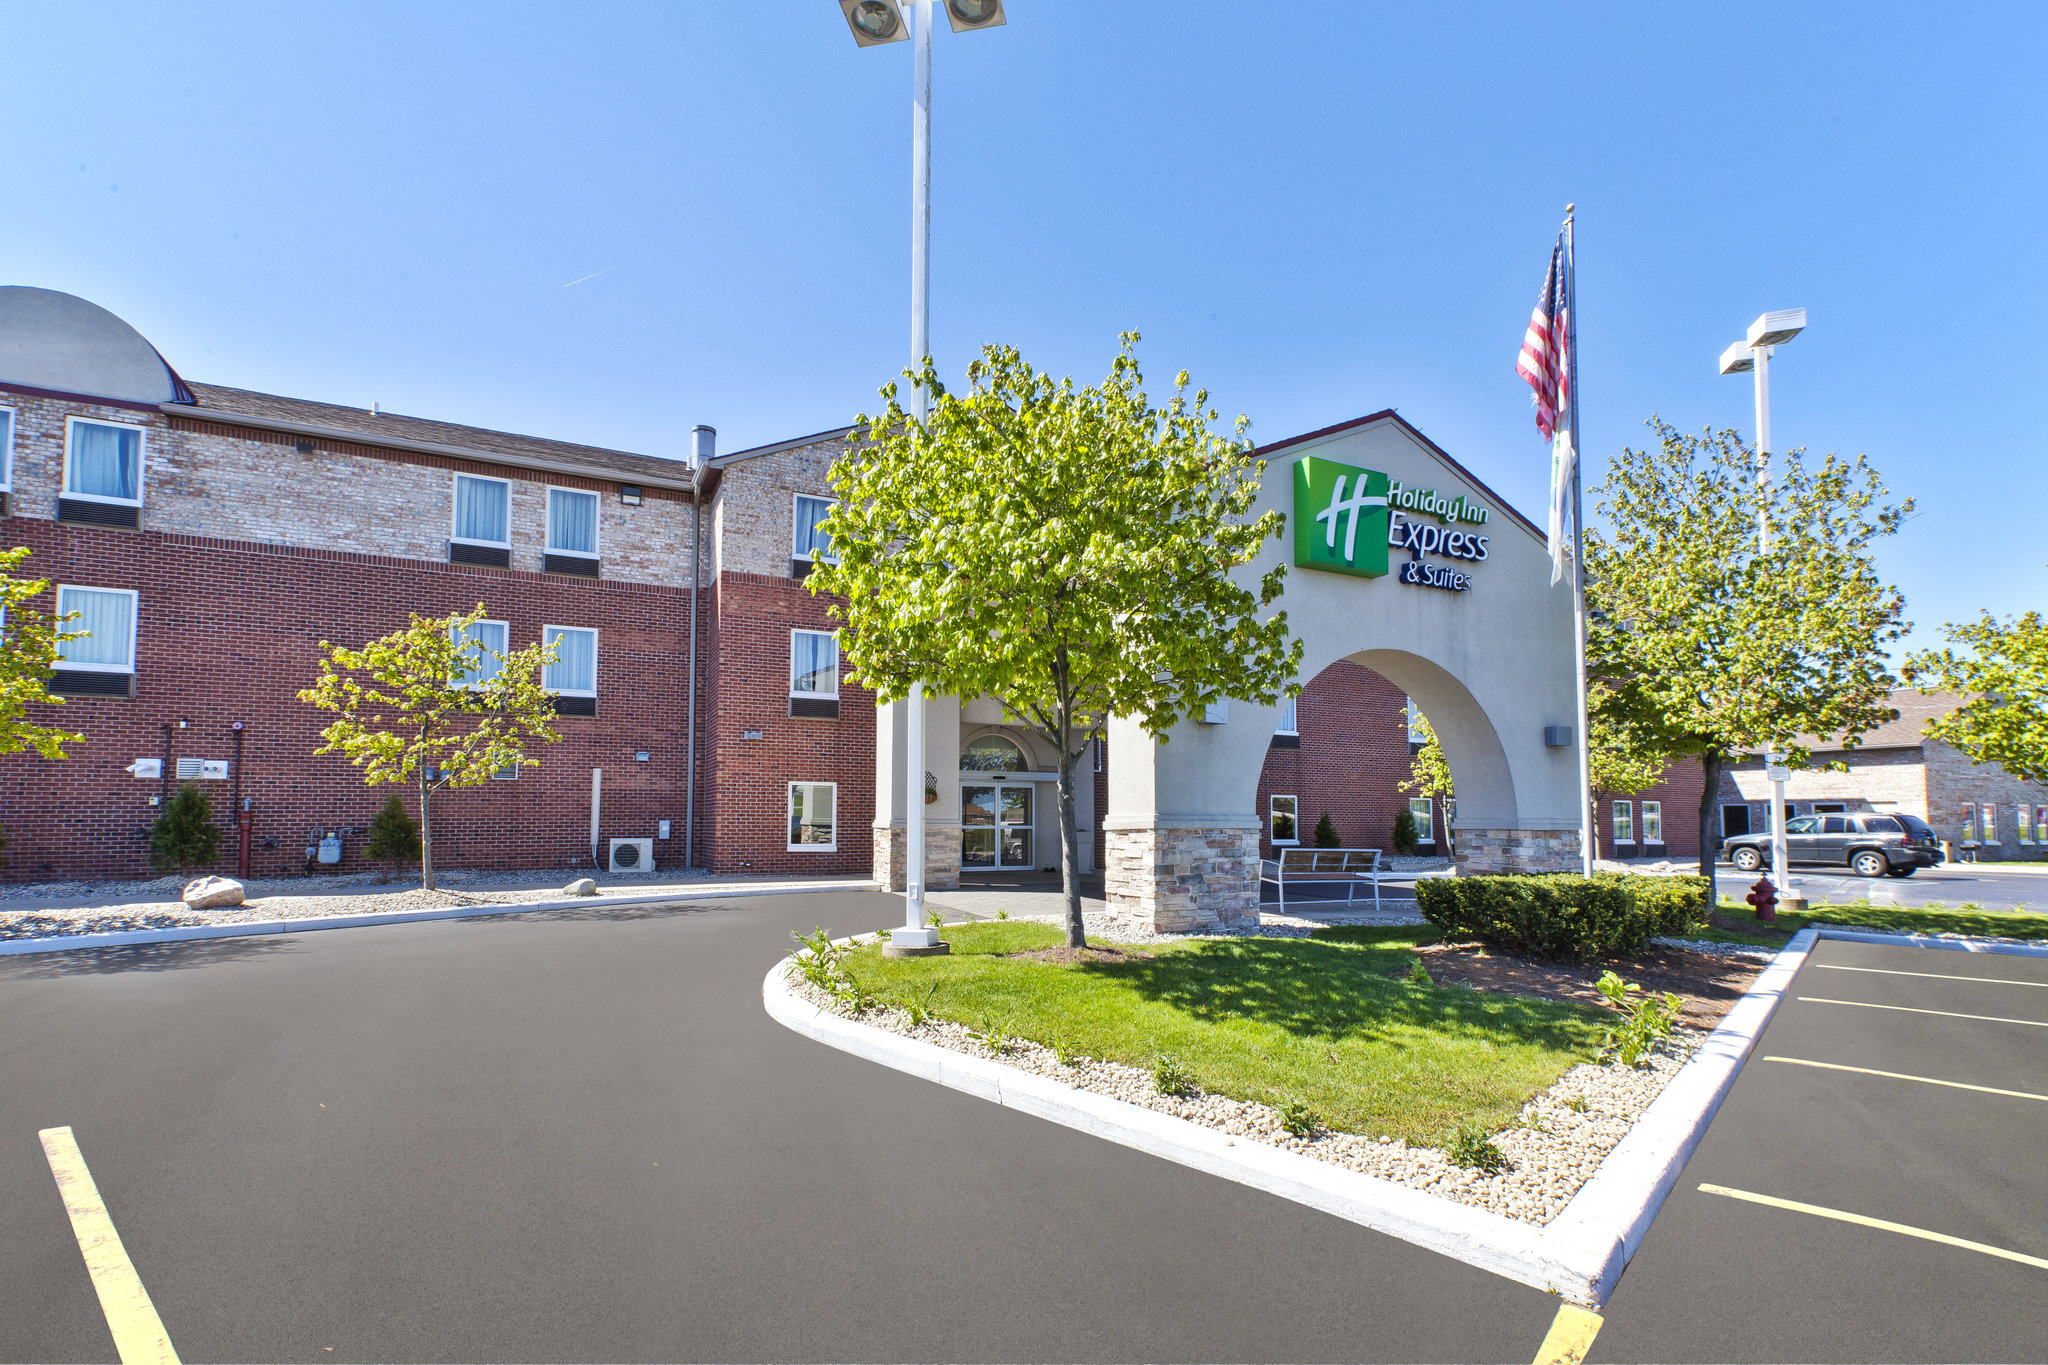 Holiday Inn Express/Suites Benton Harbor